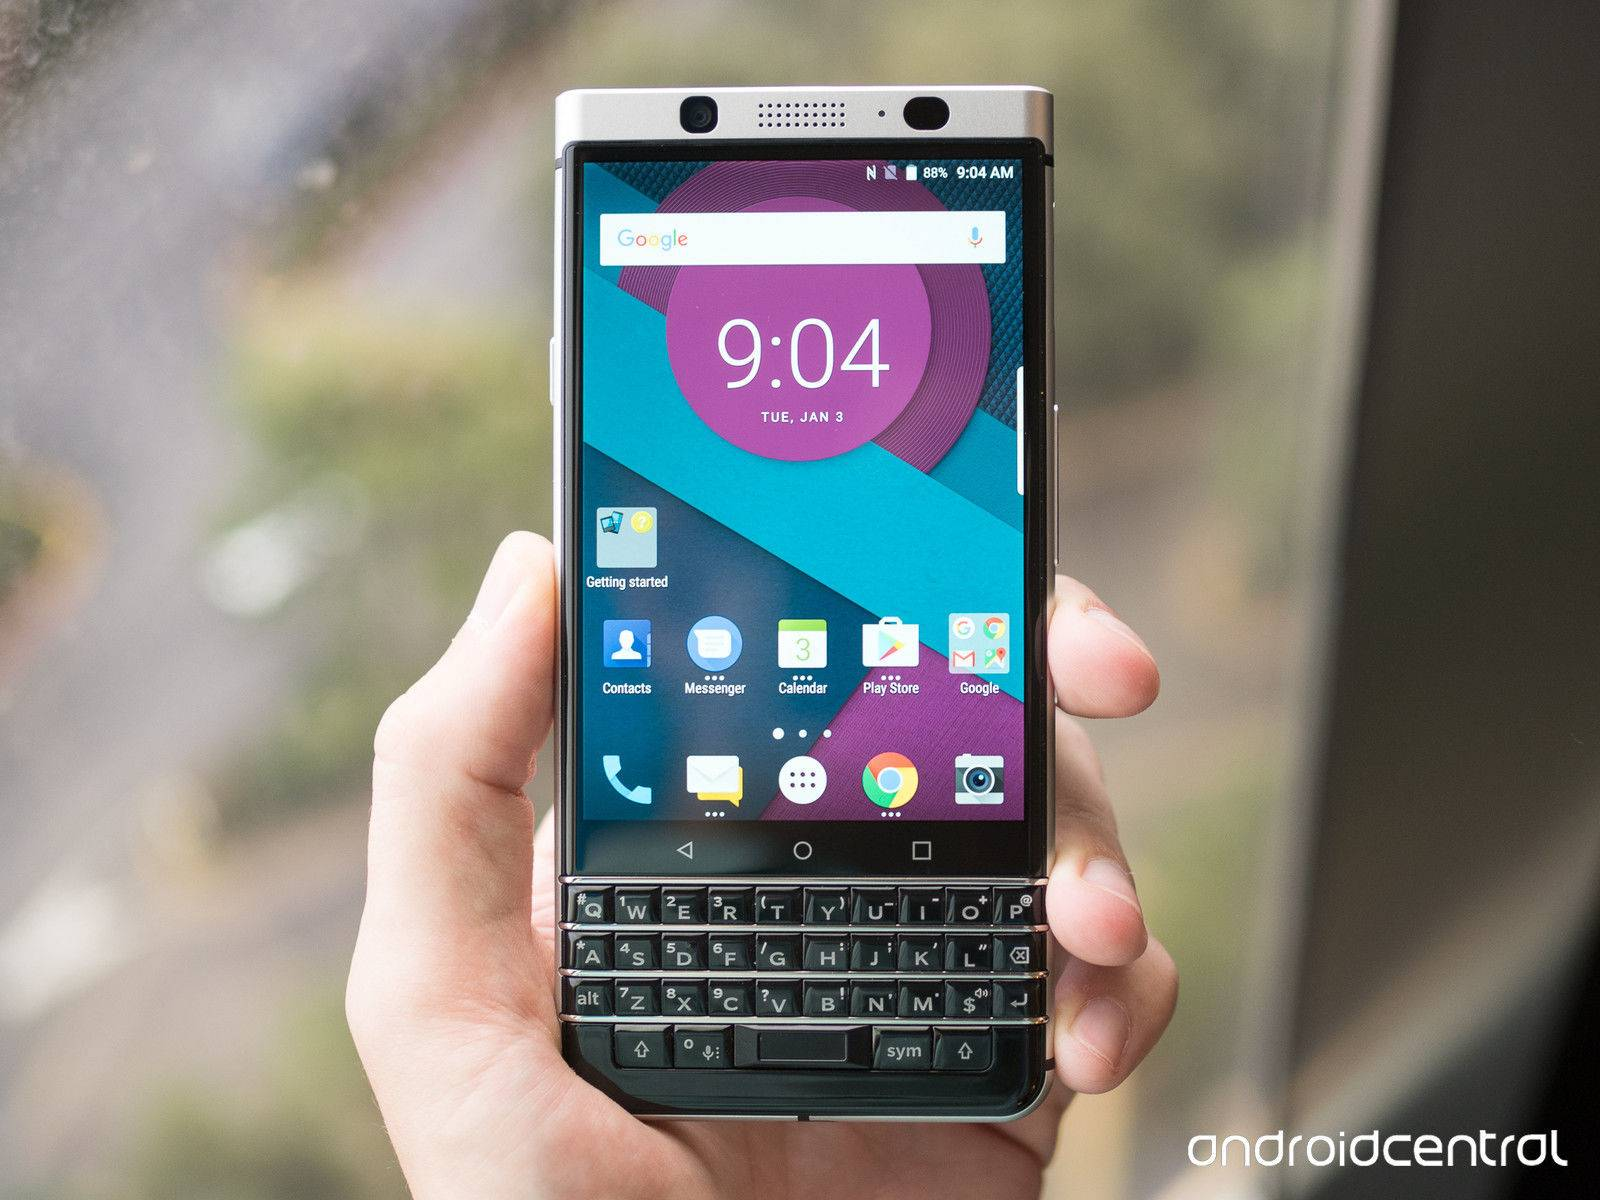 blackberry-mercury-pre-production-12_0.jpg